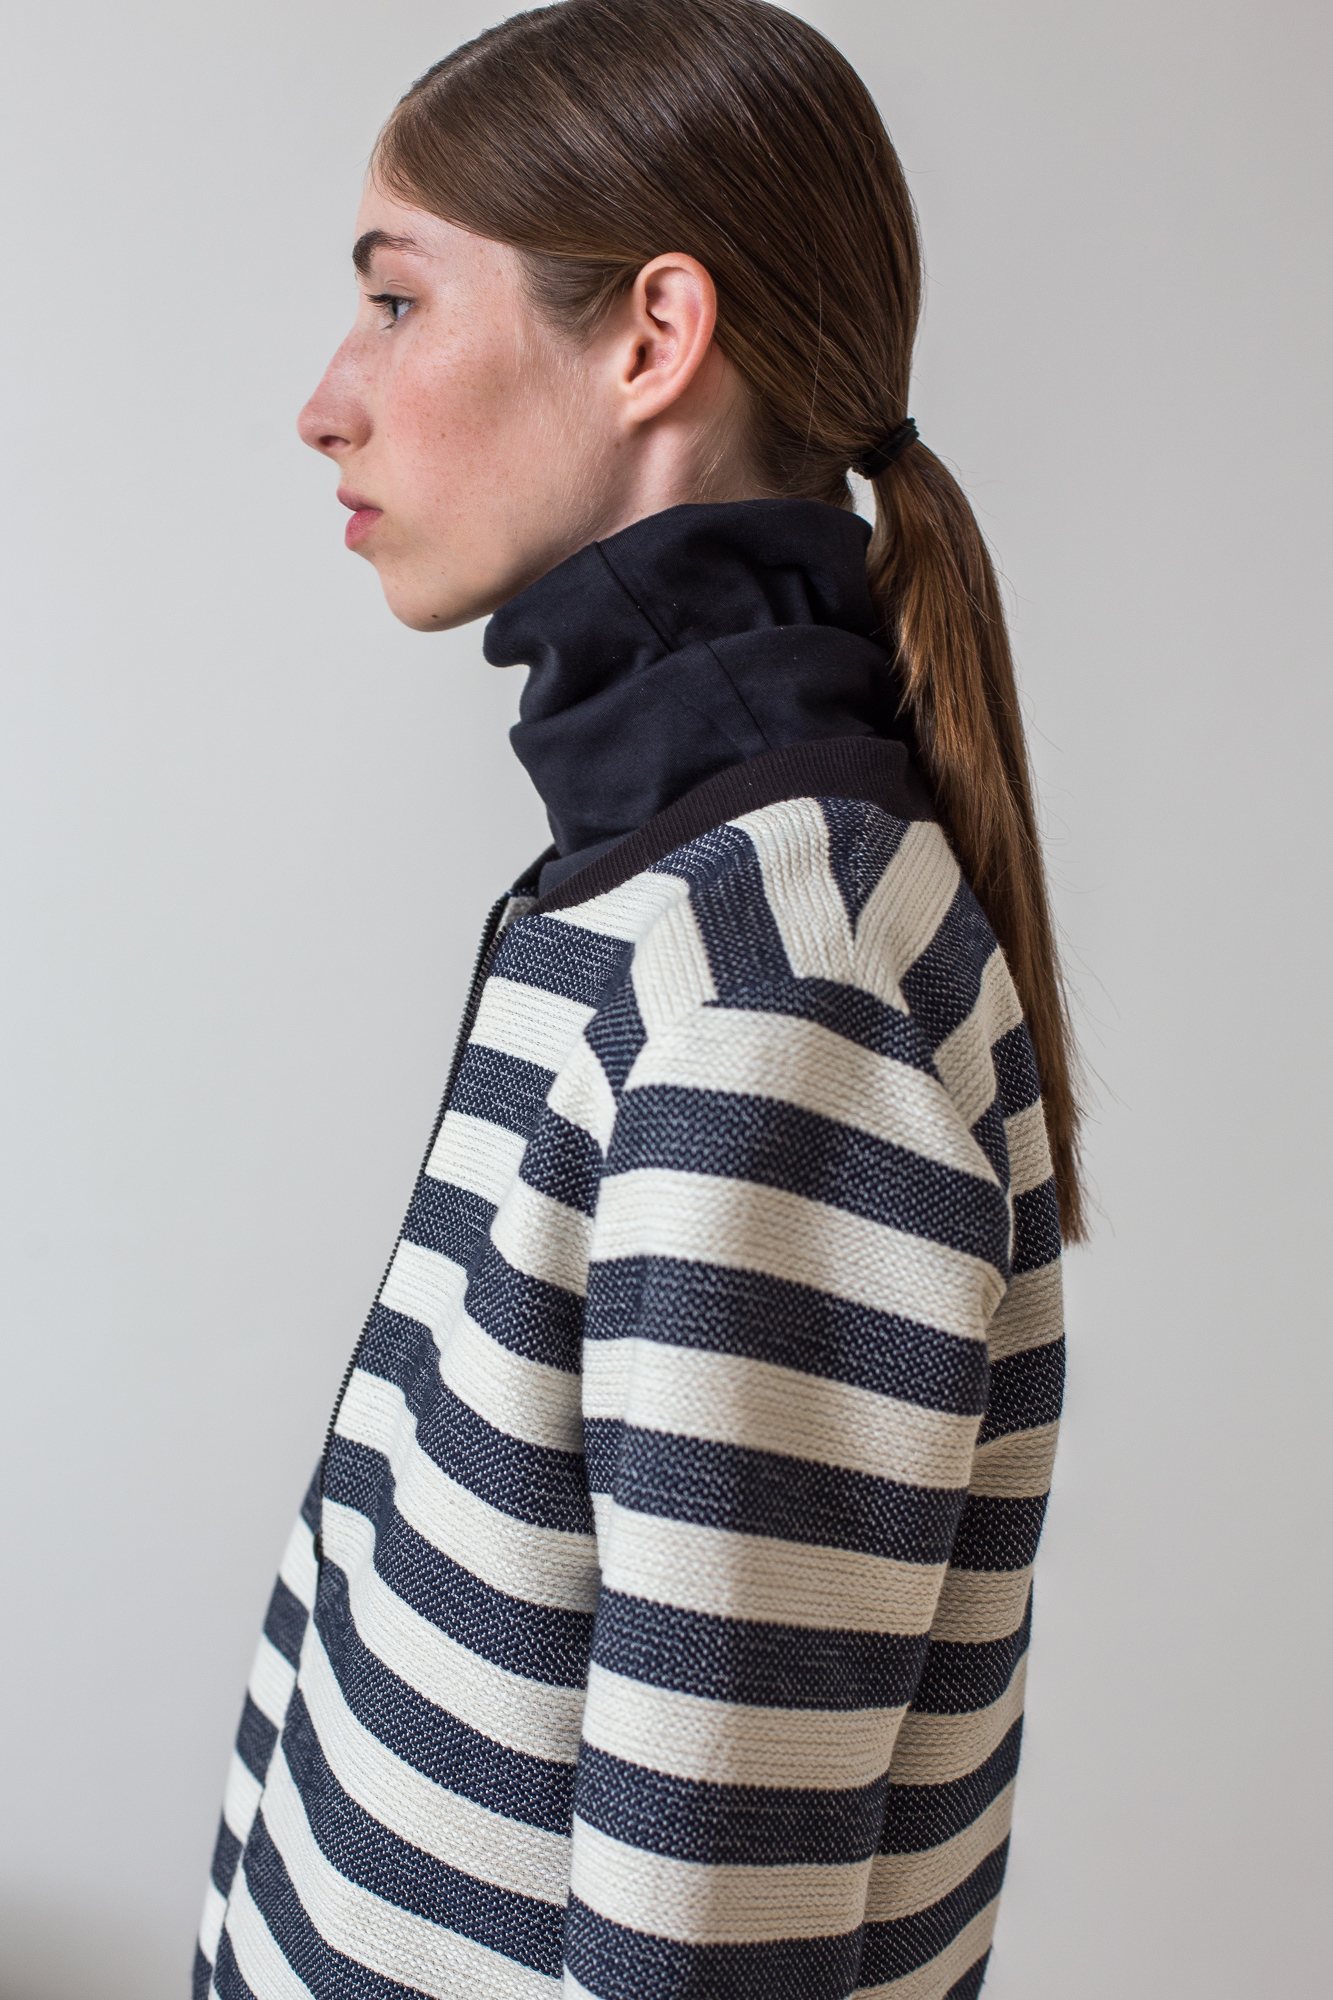 wearenotsisters_wrns_contour-jacket_05